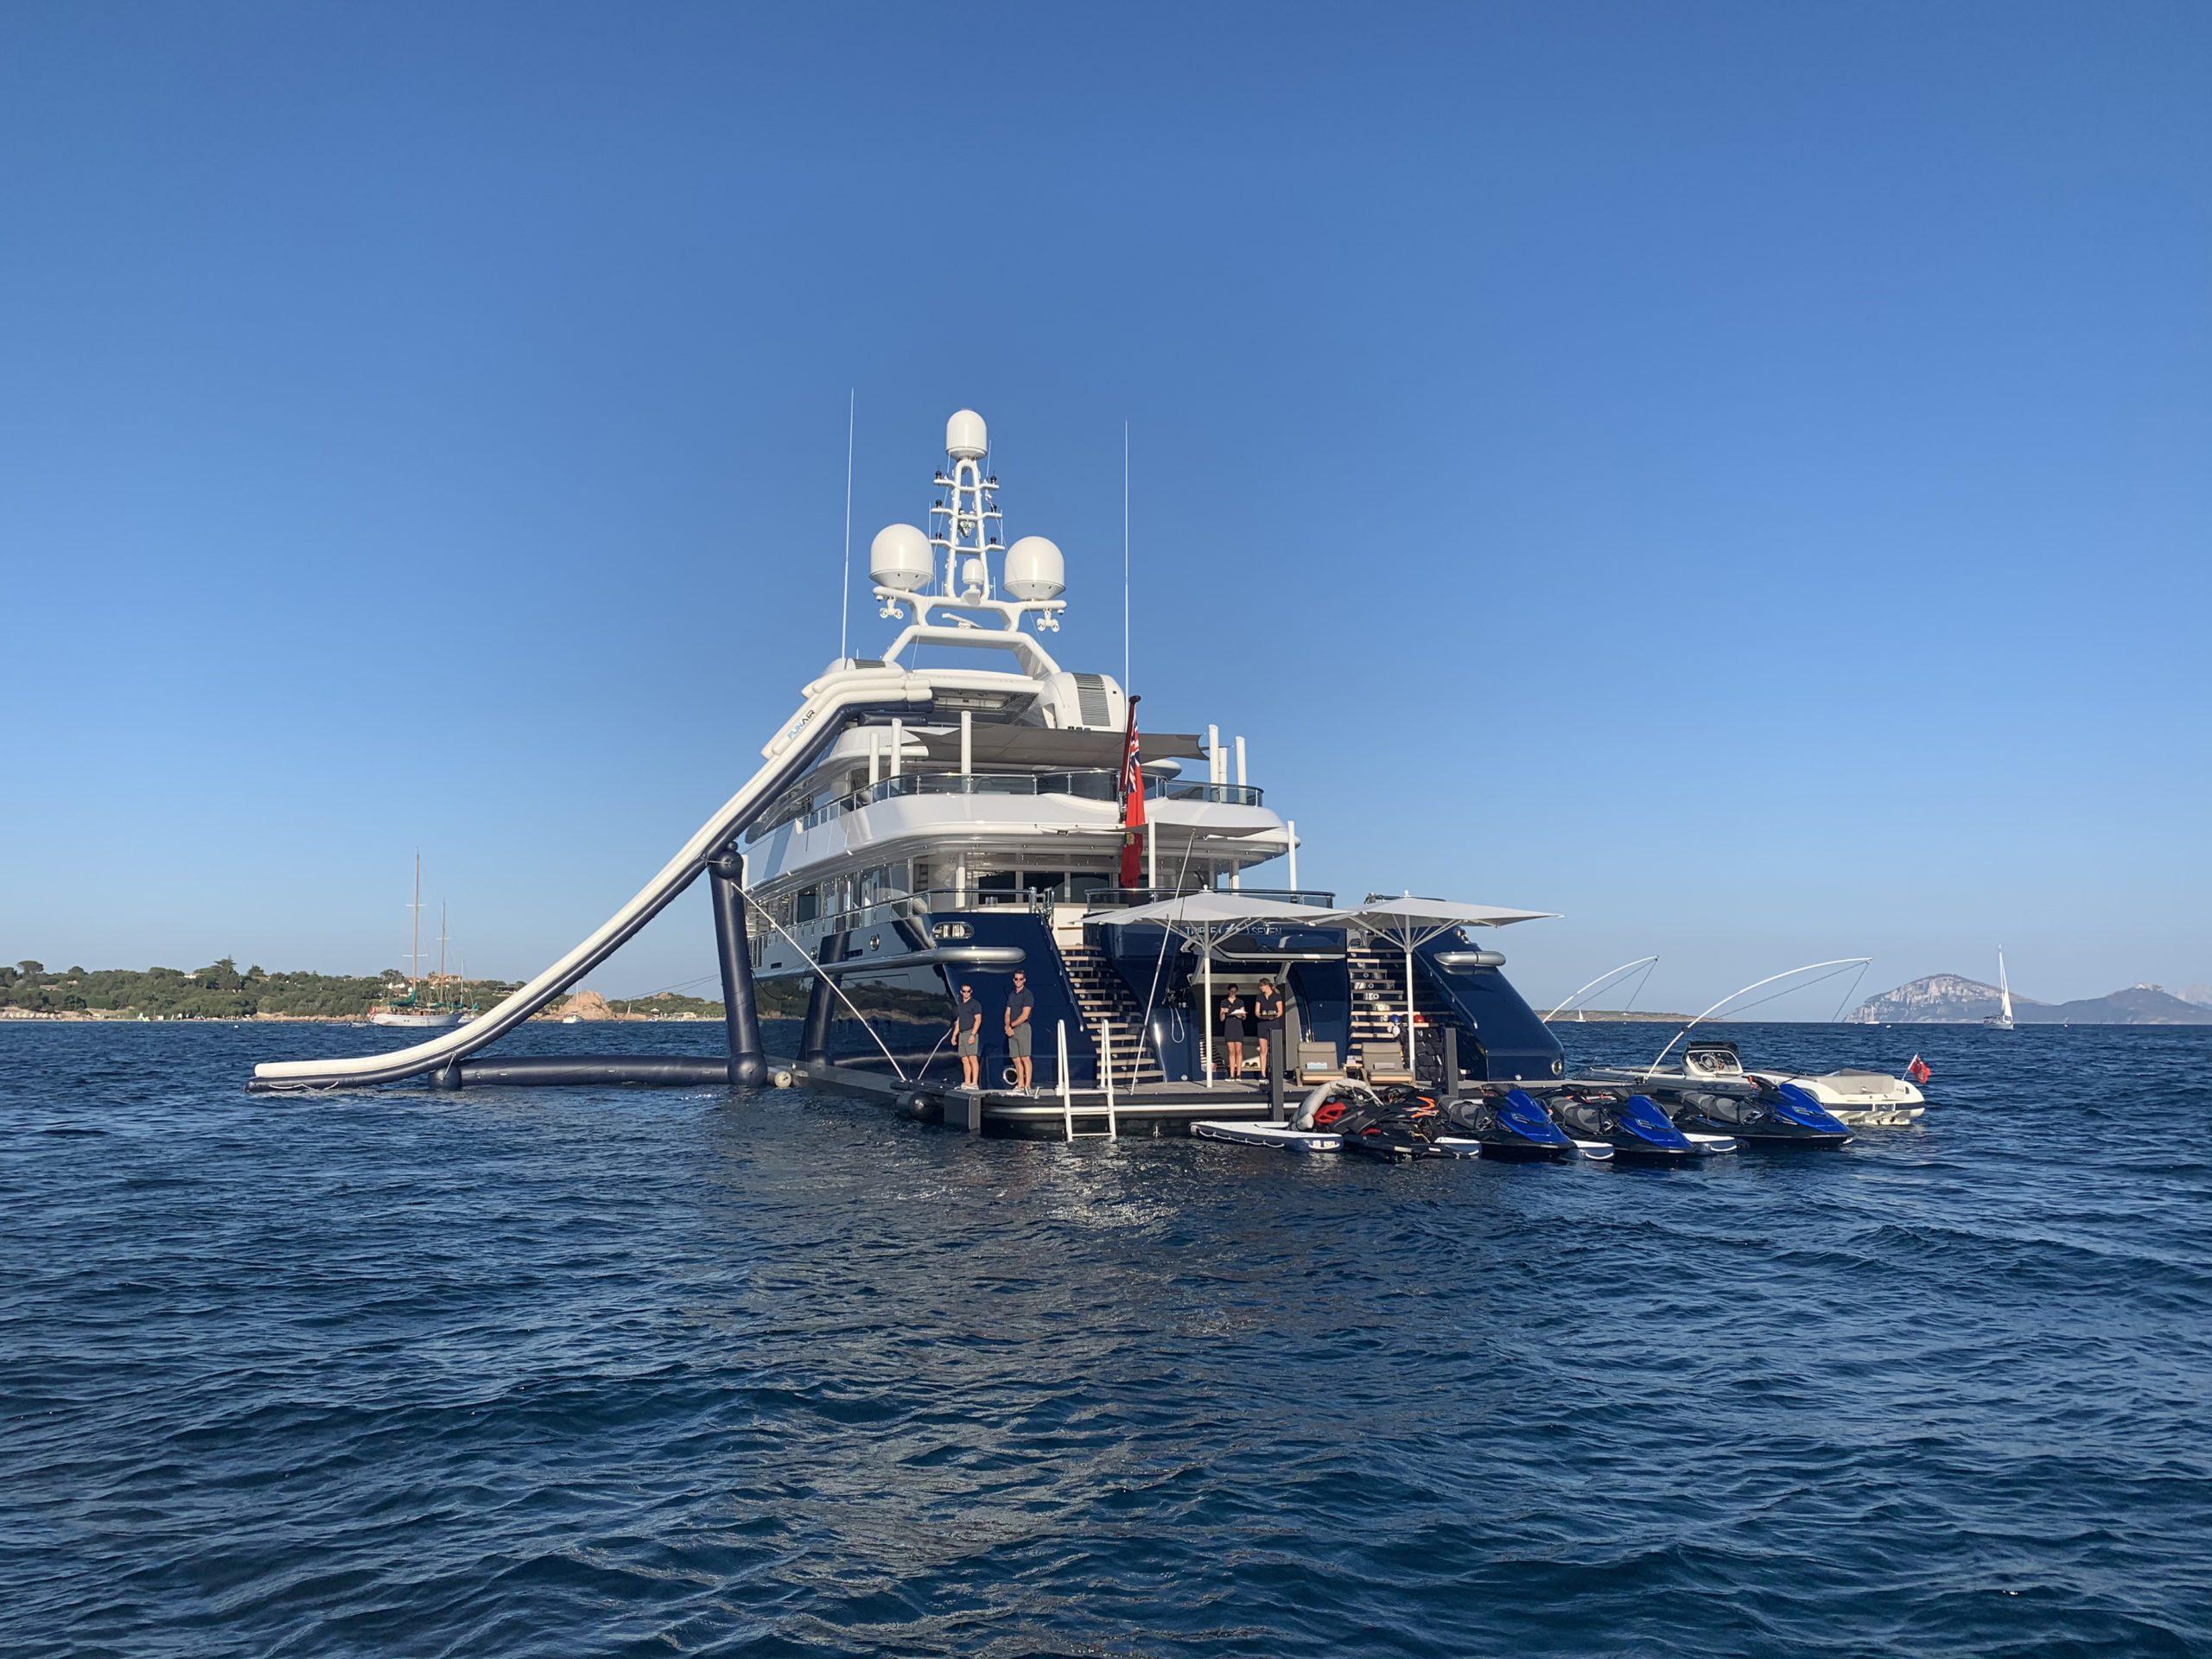 superyacht with Yacht Slide and custom Jet Ski Dock